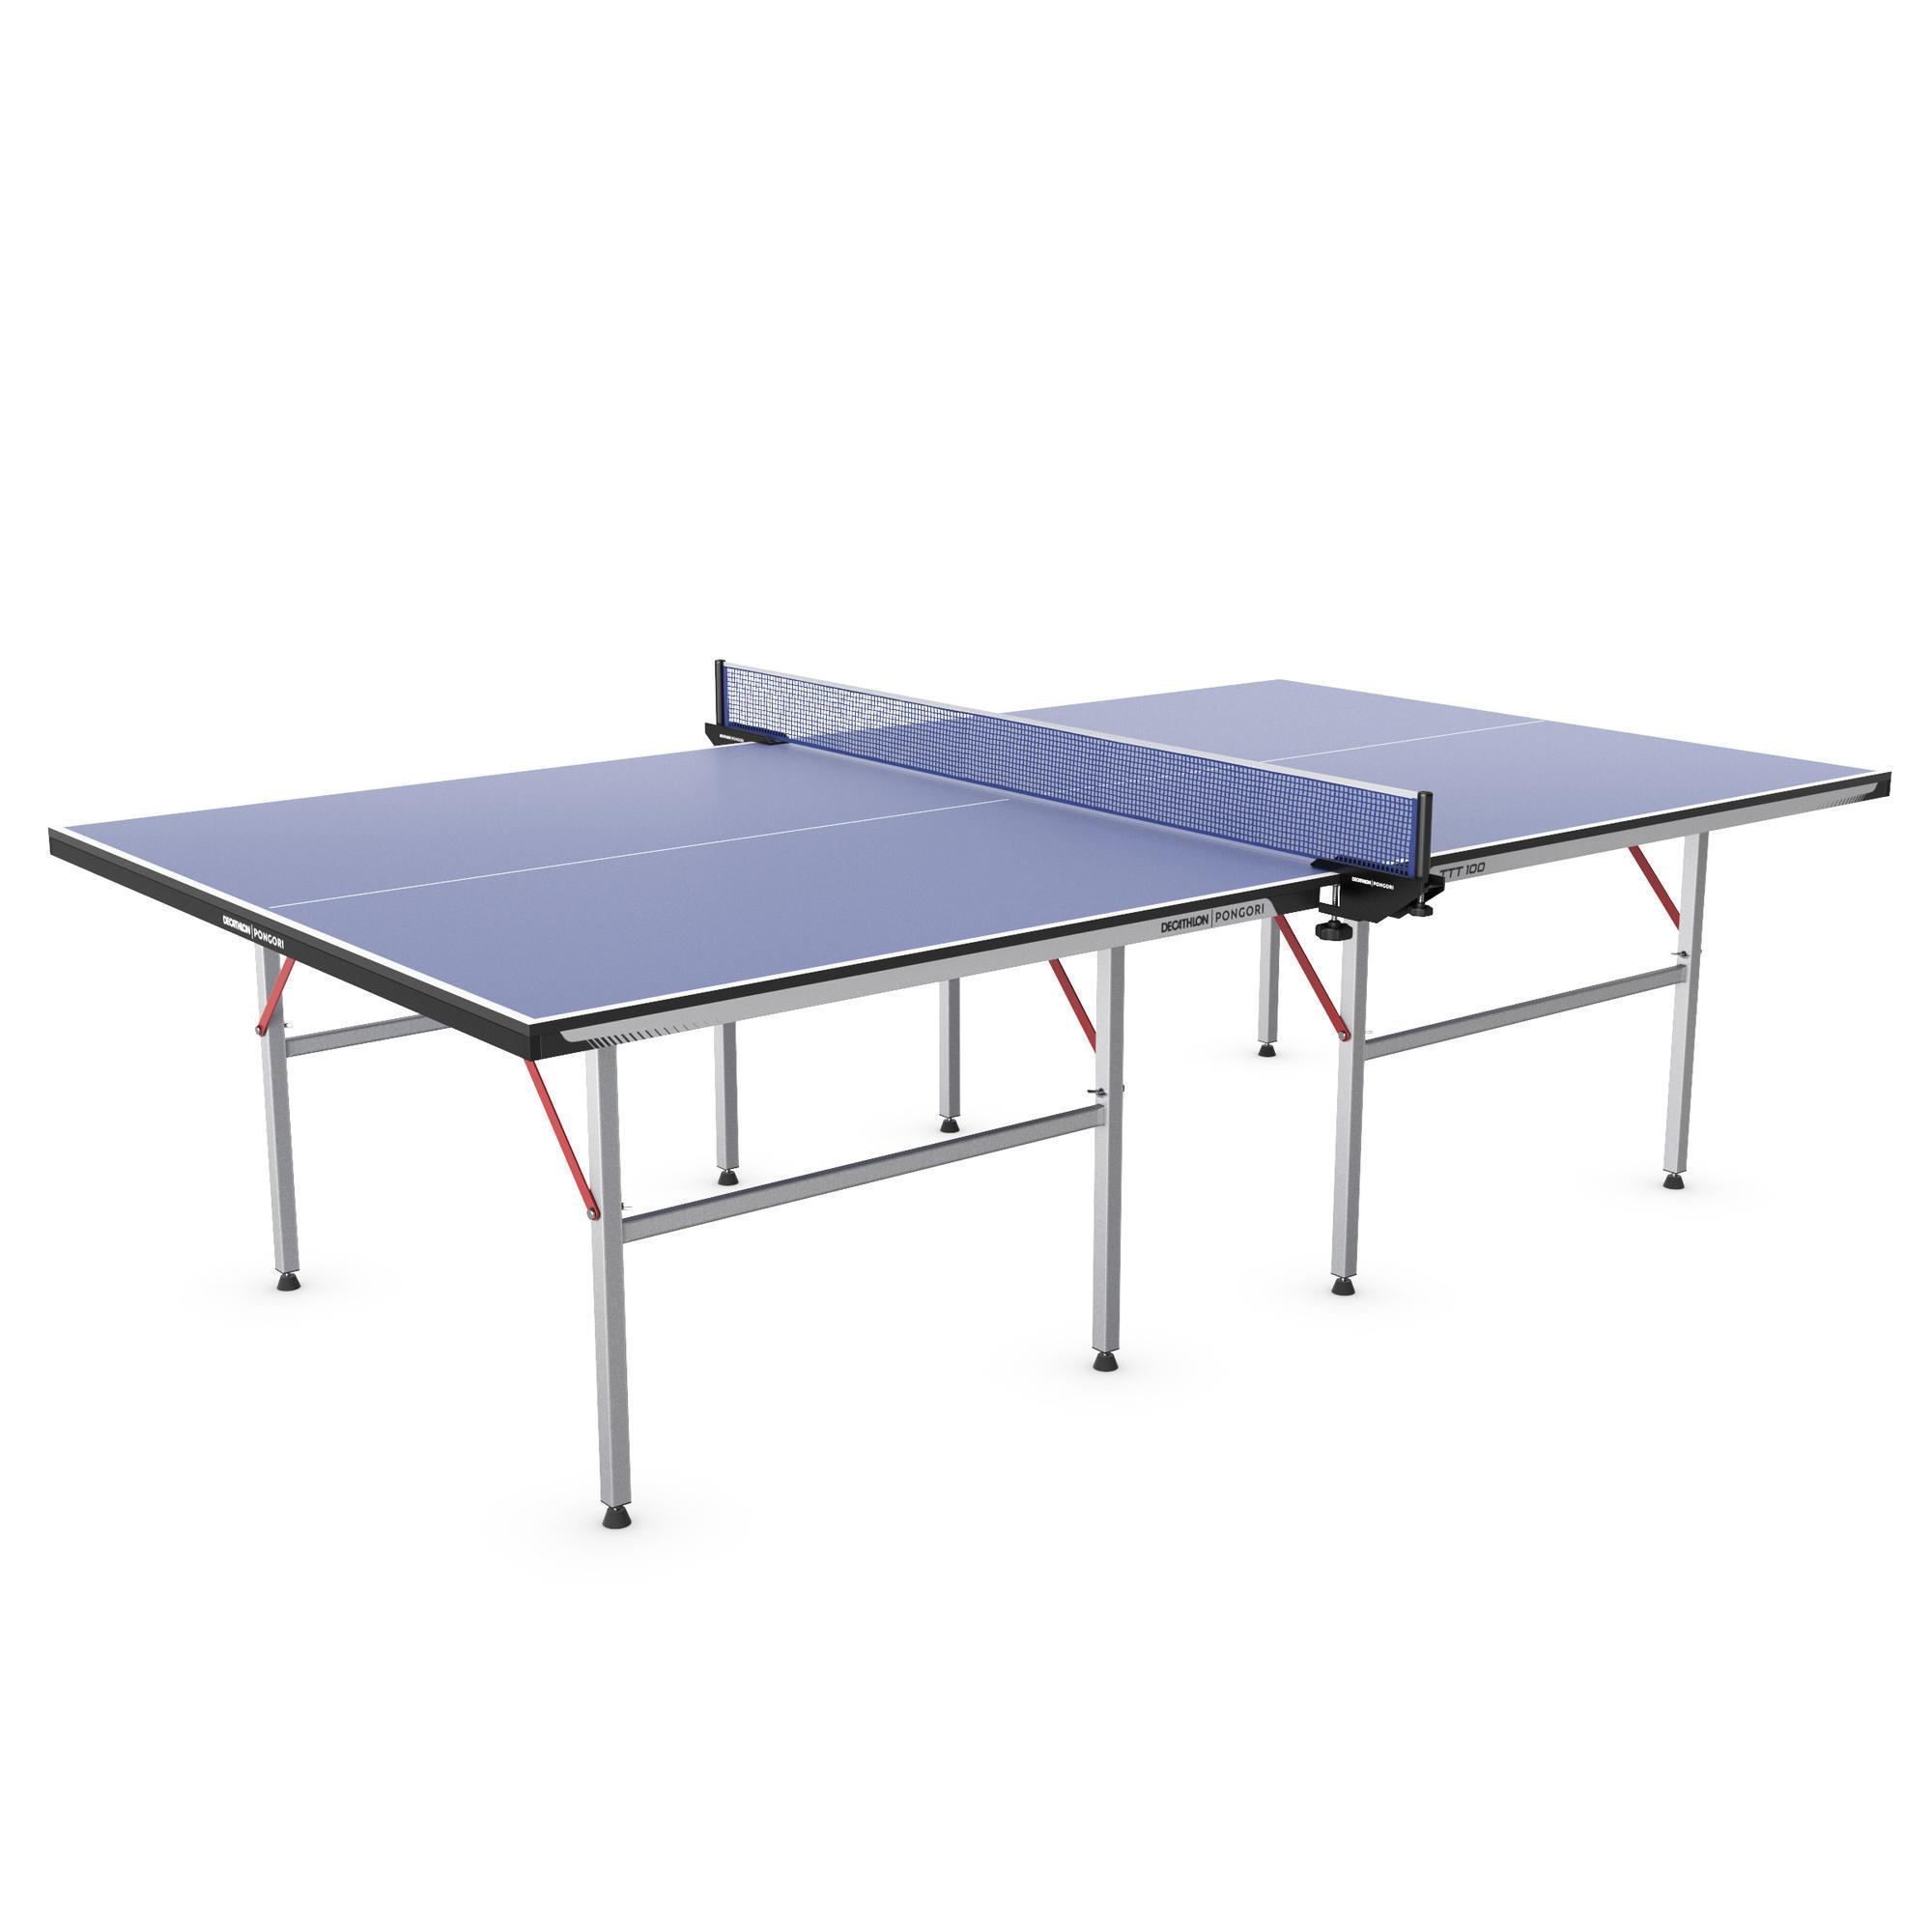 Tables Indoor Interieur De Ping Pong Decathlon